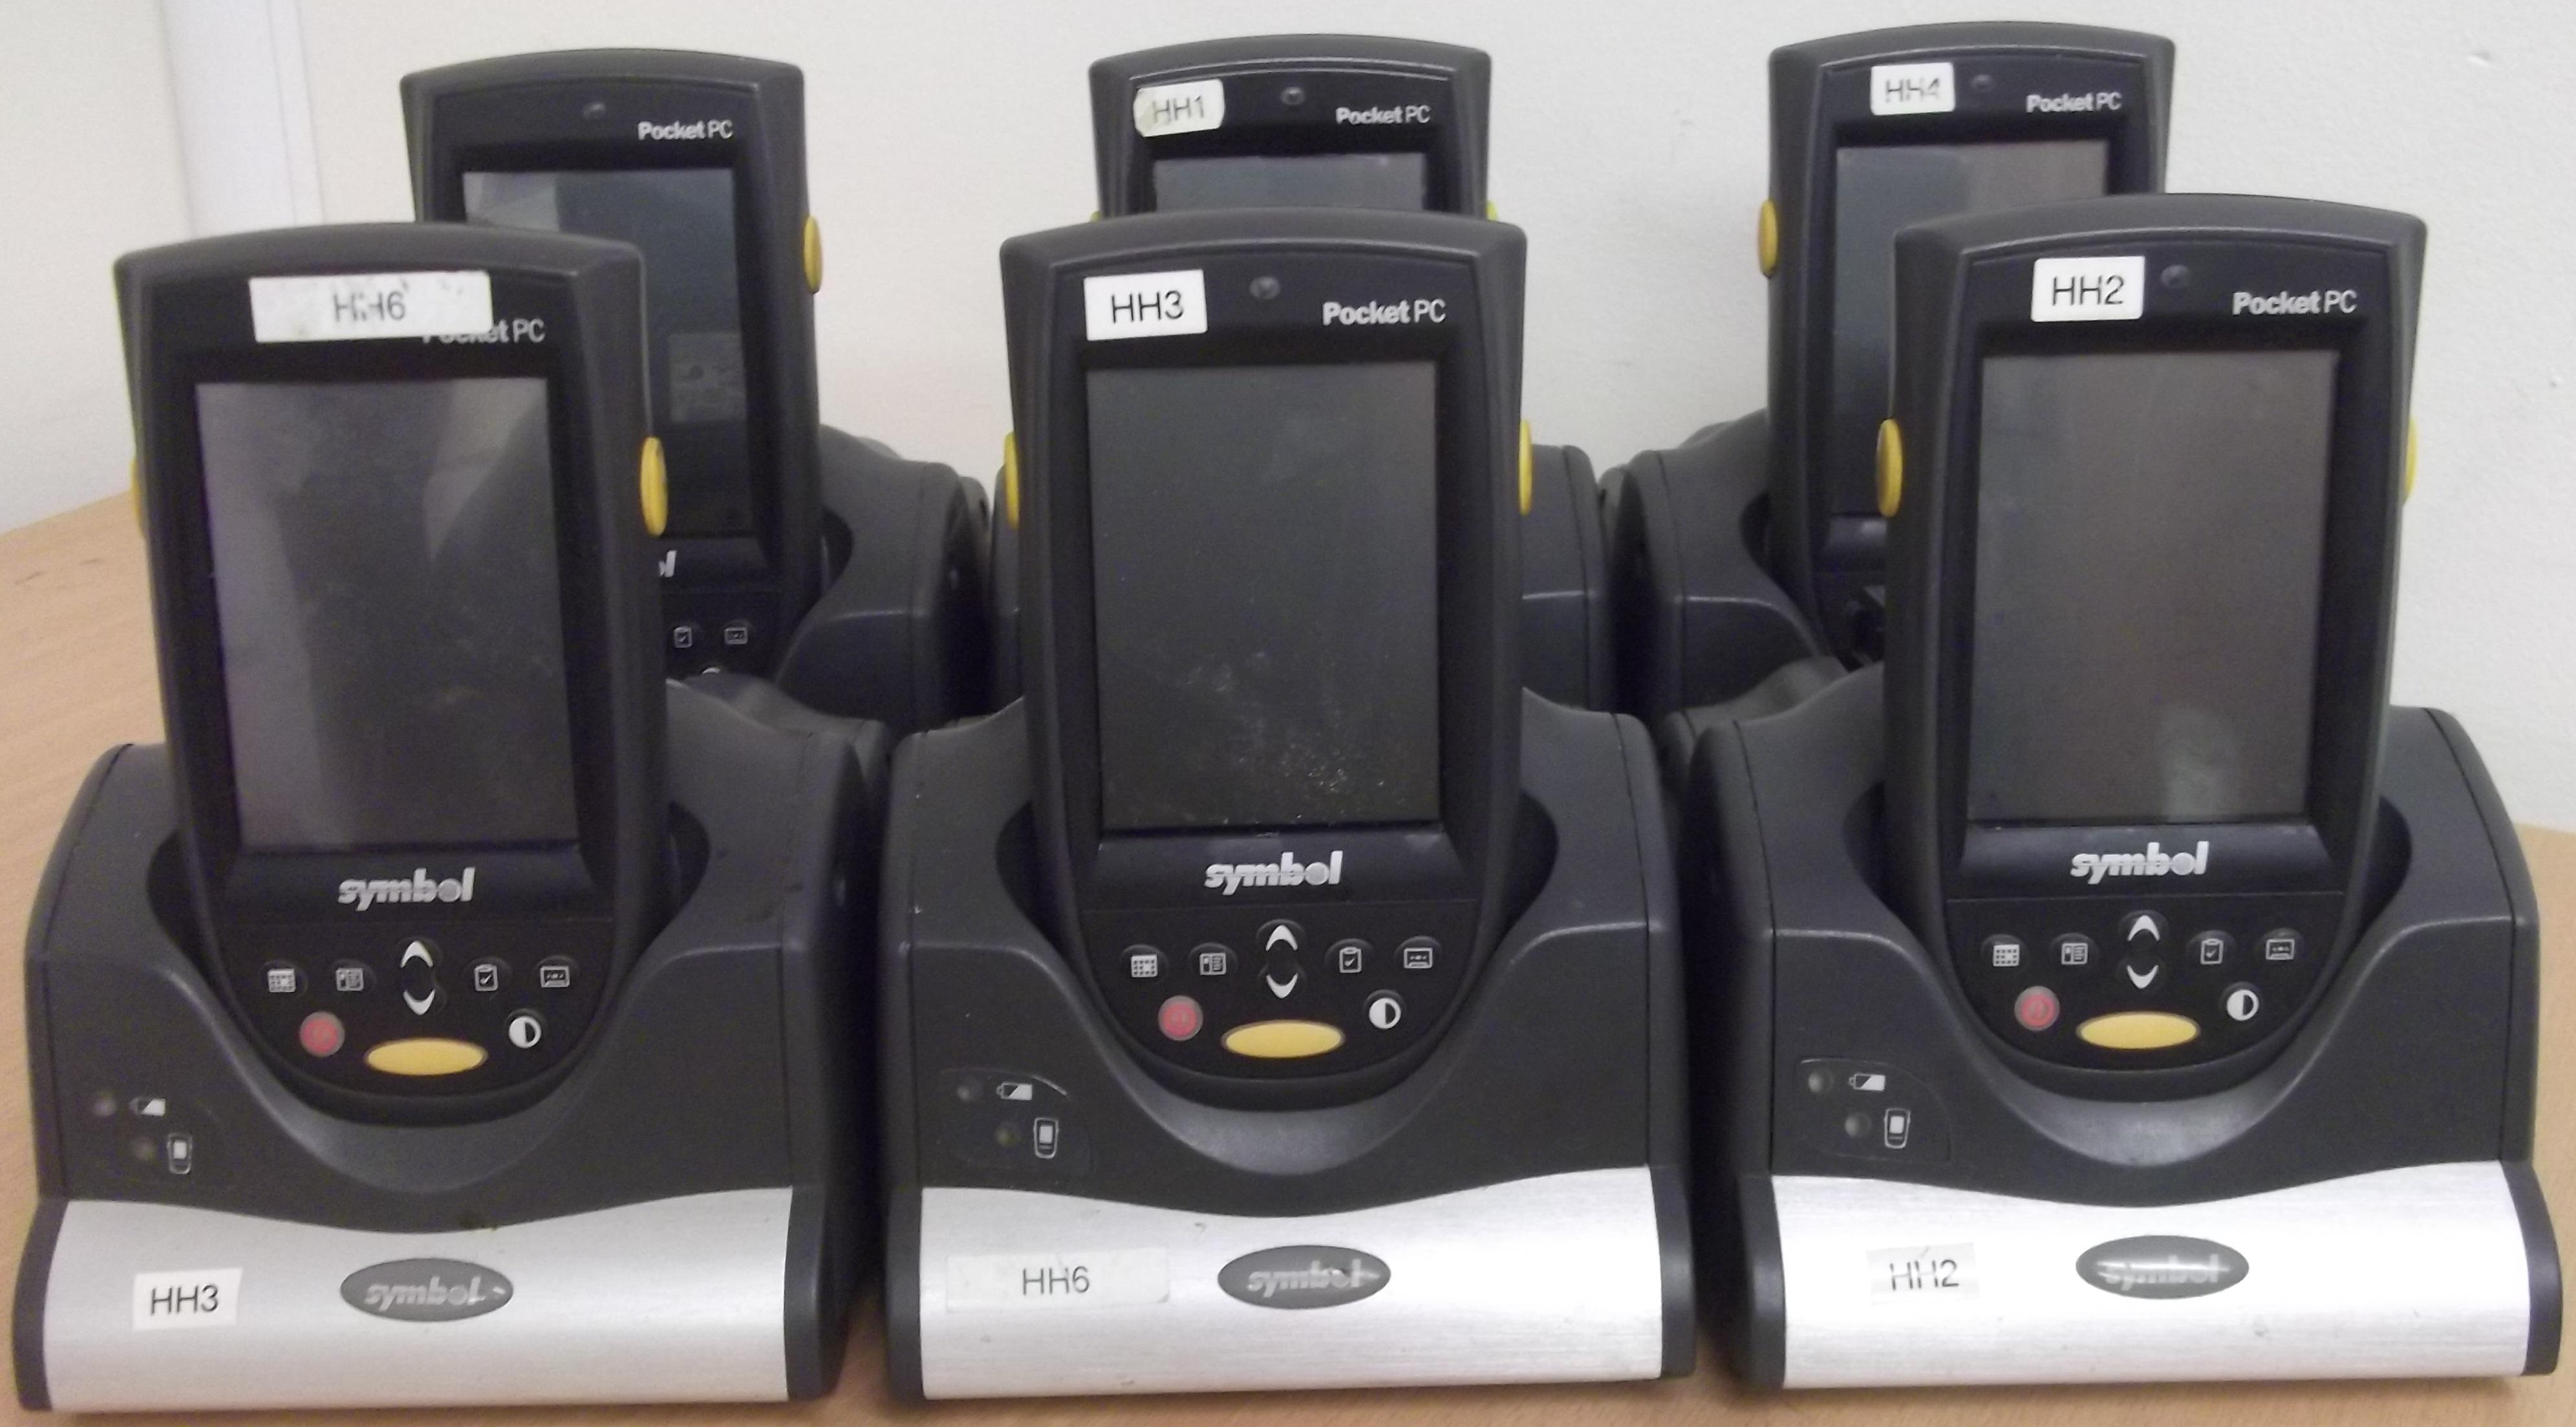 6 x symbol n410 wireless handheld pocket pc barcode scanner lot 568 6 x symbol n410 wireless handheld pocket pc barcode scanner wireless buycottarizona